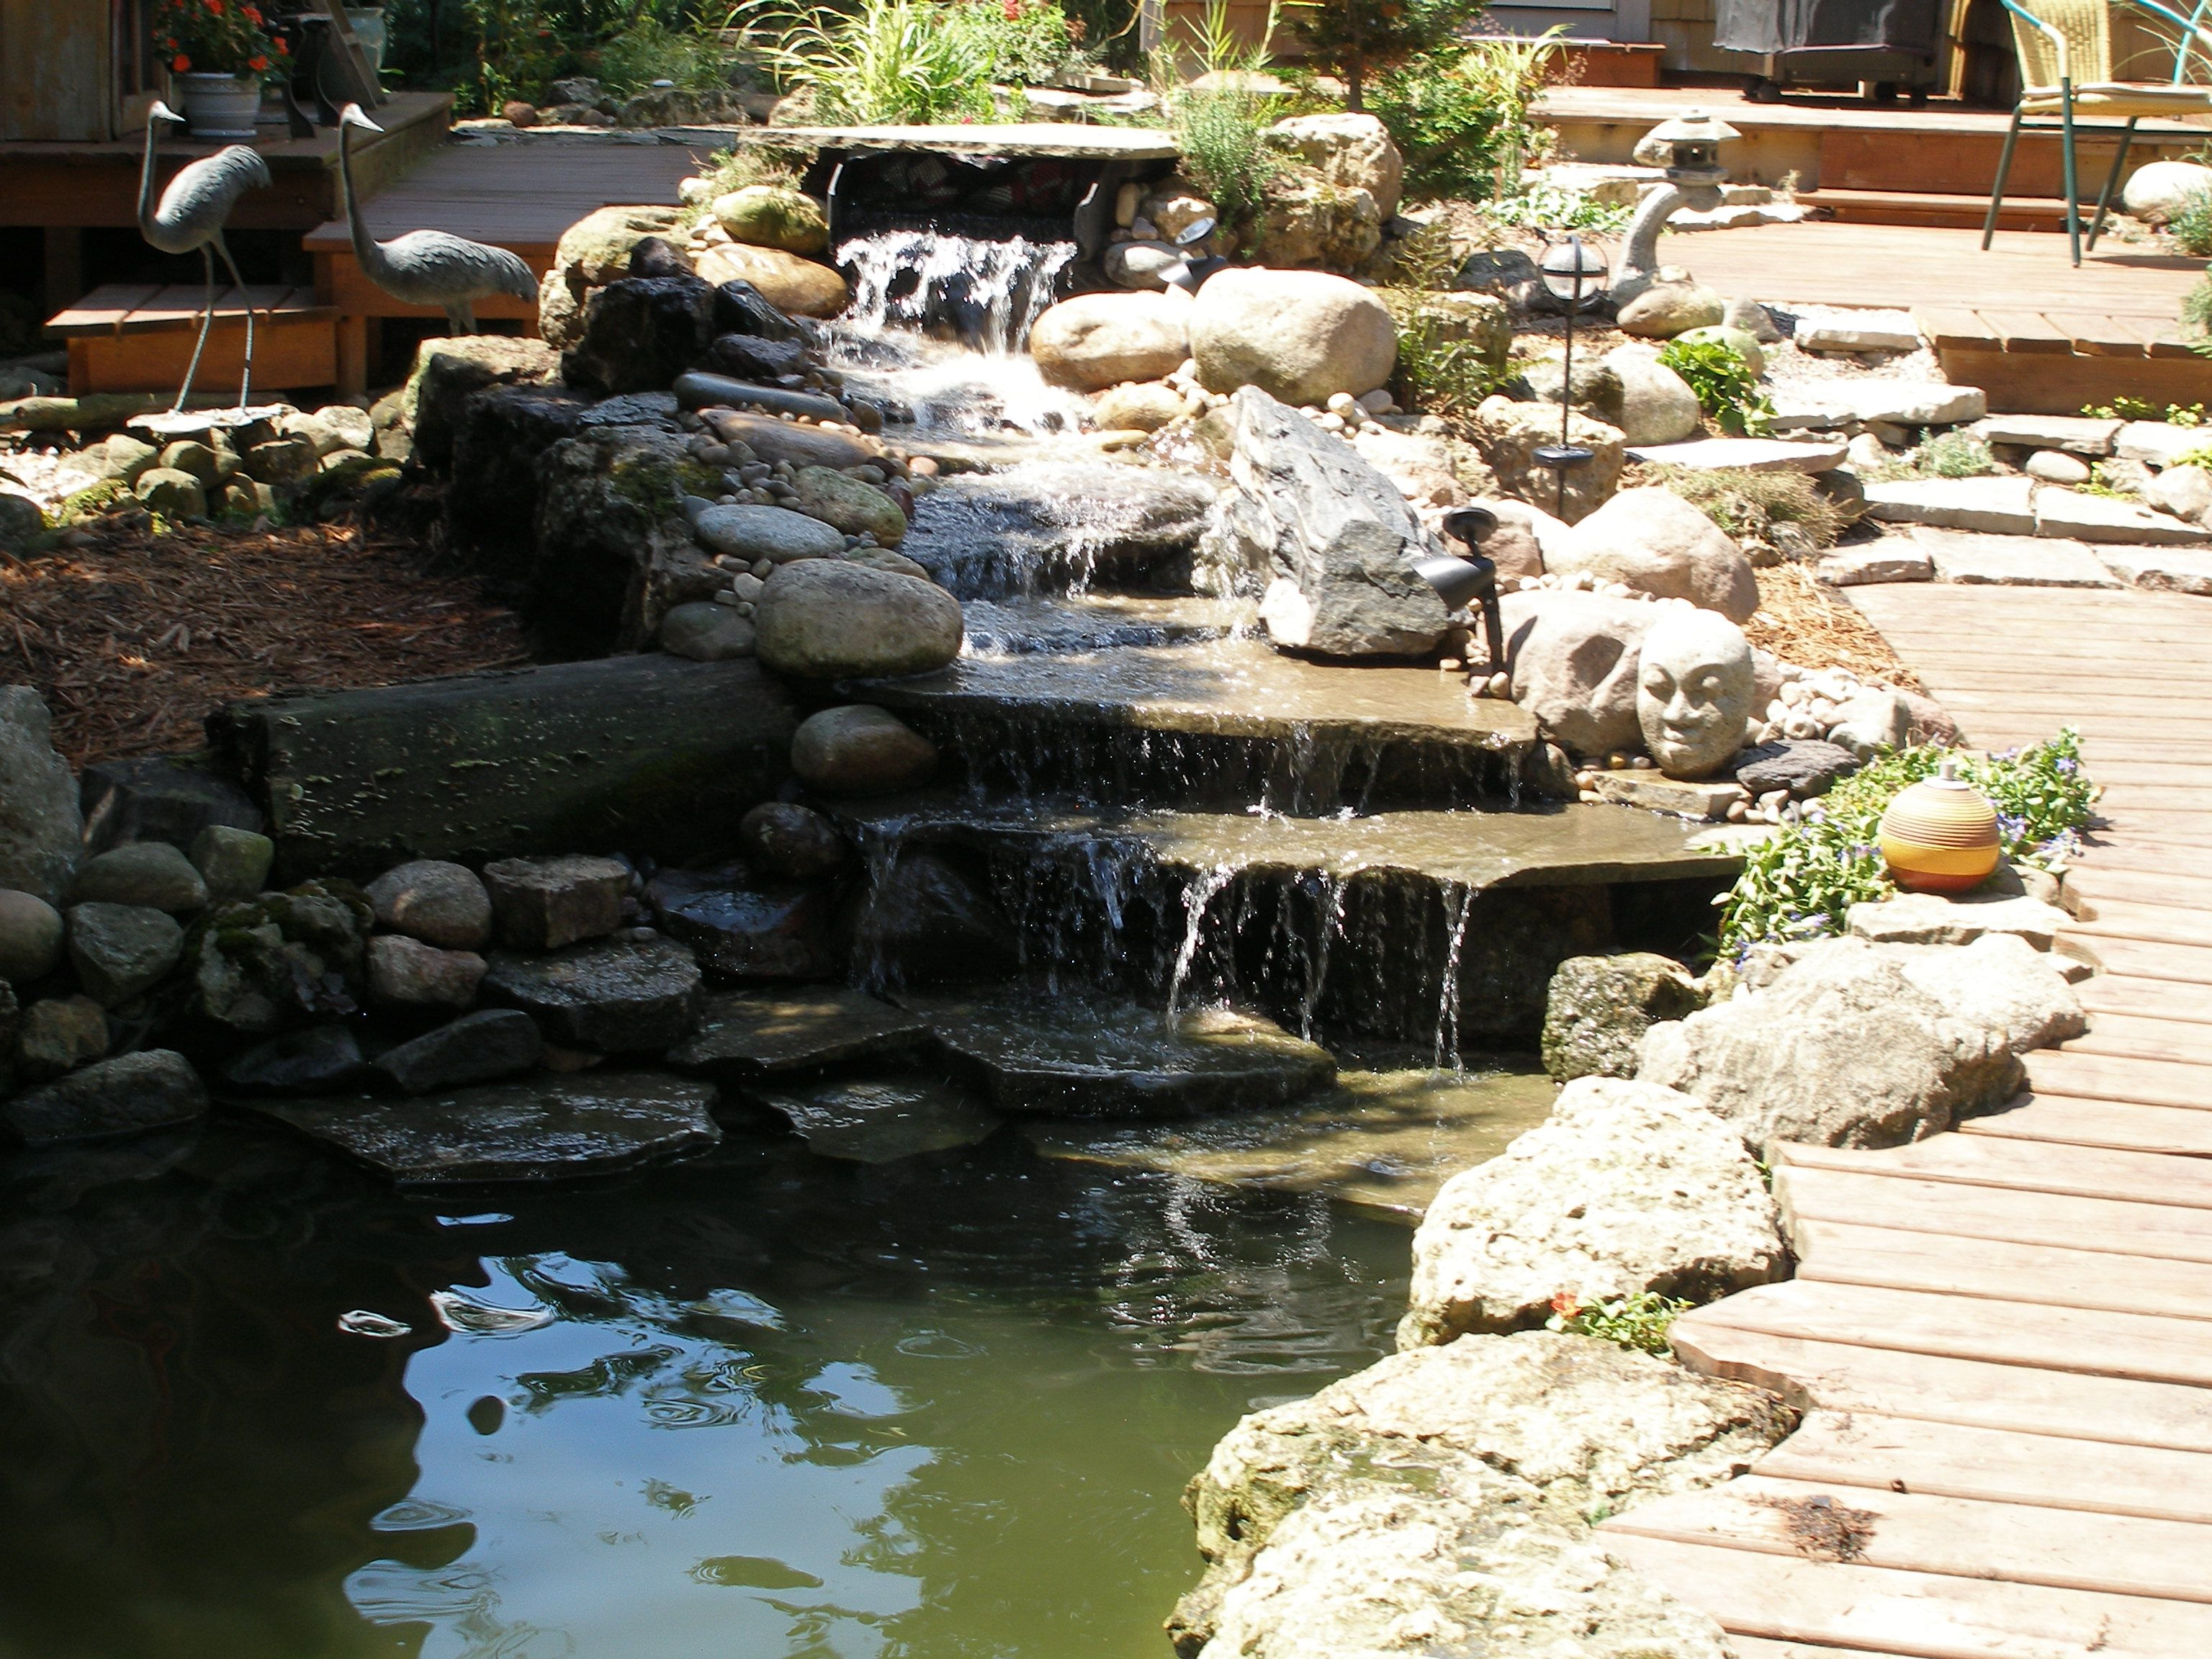 DIY waterfall | Garden waterfall, Diy waterfall, Waterfall